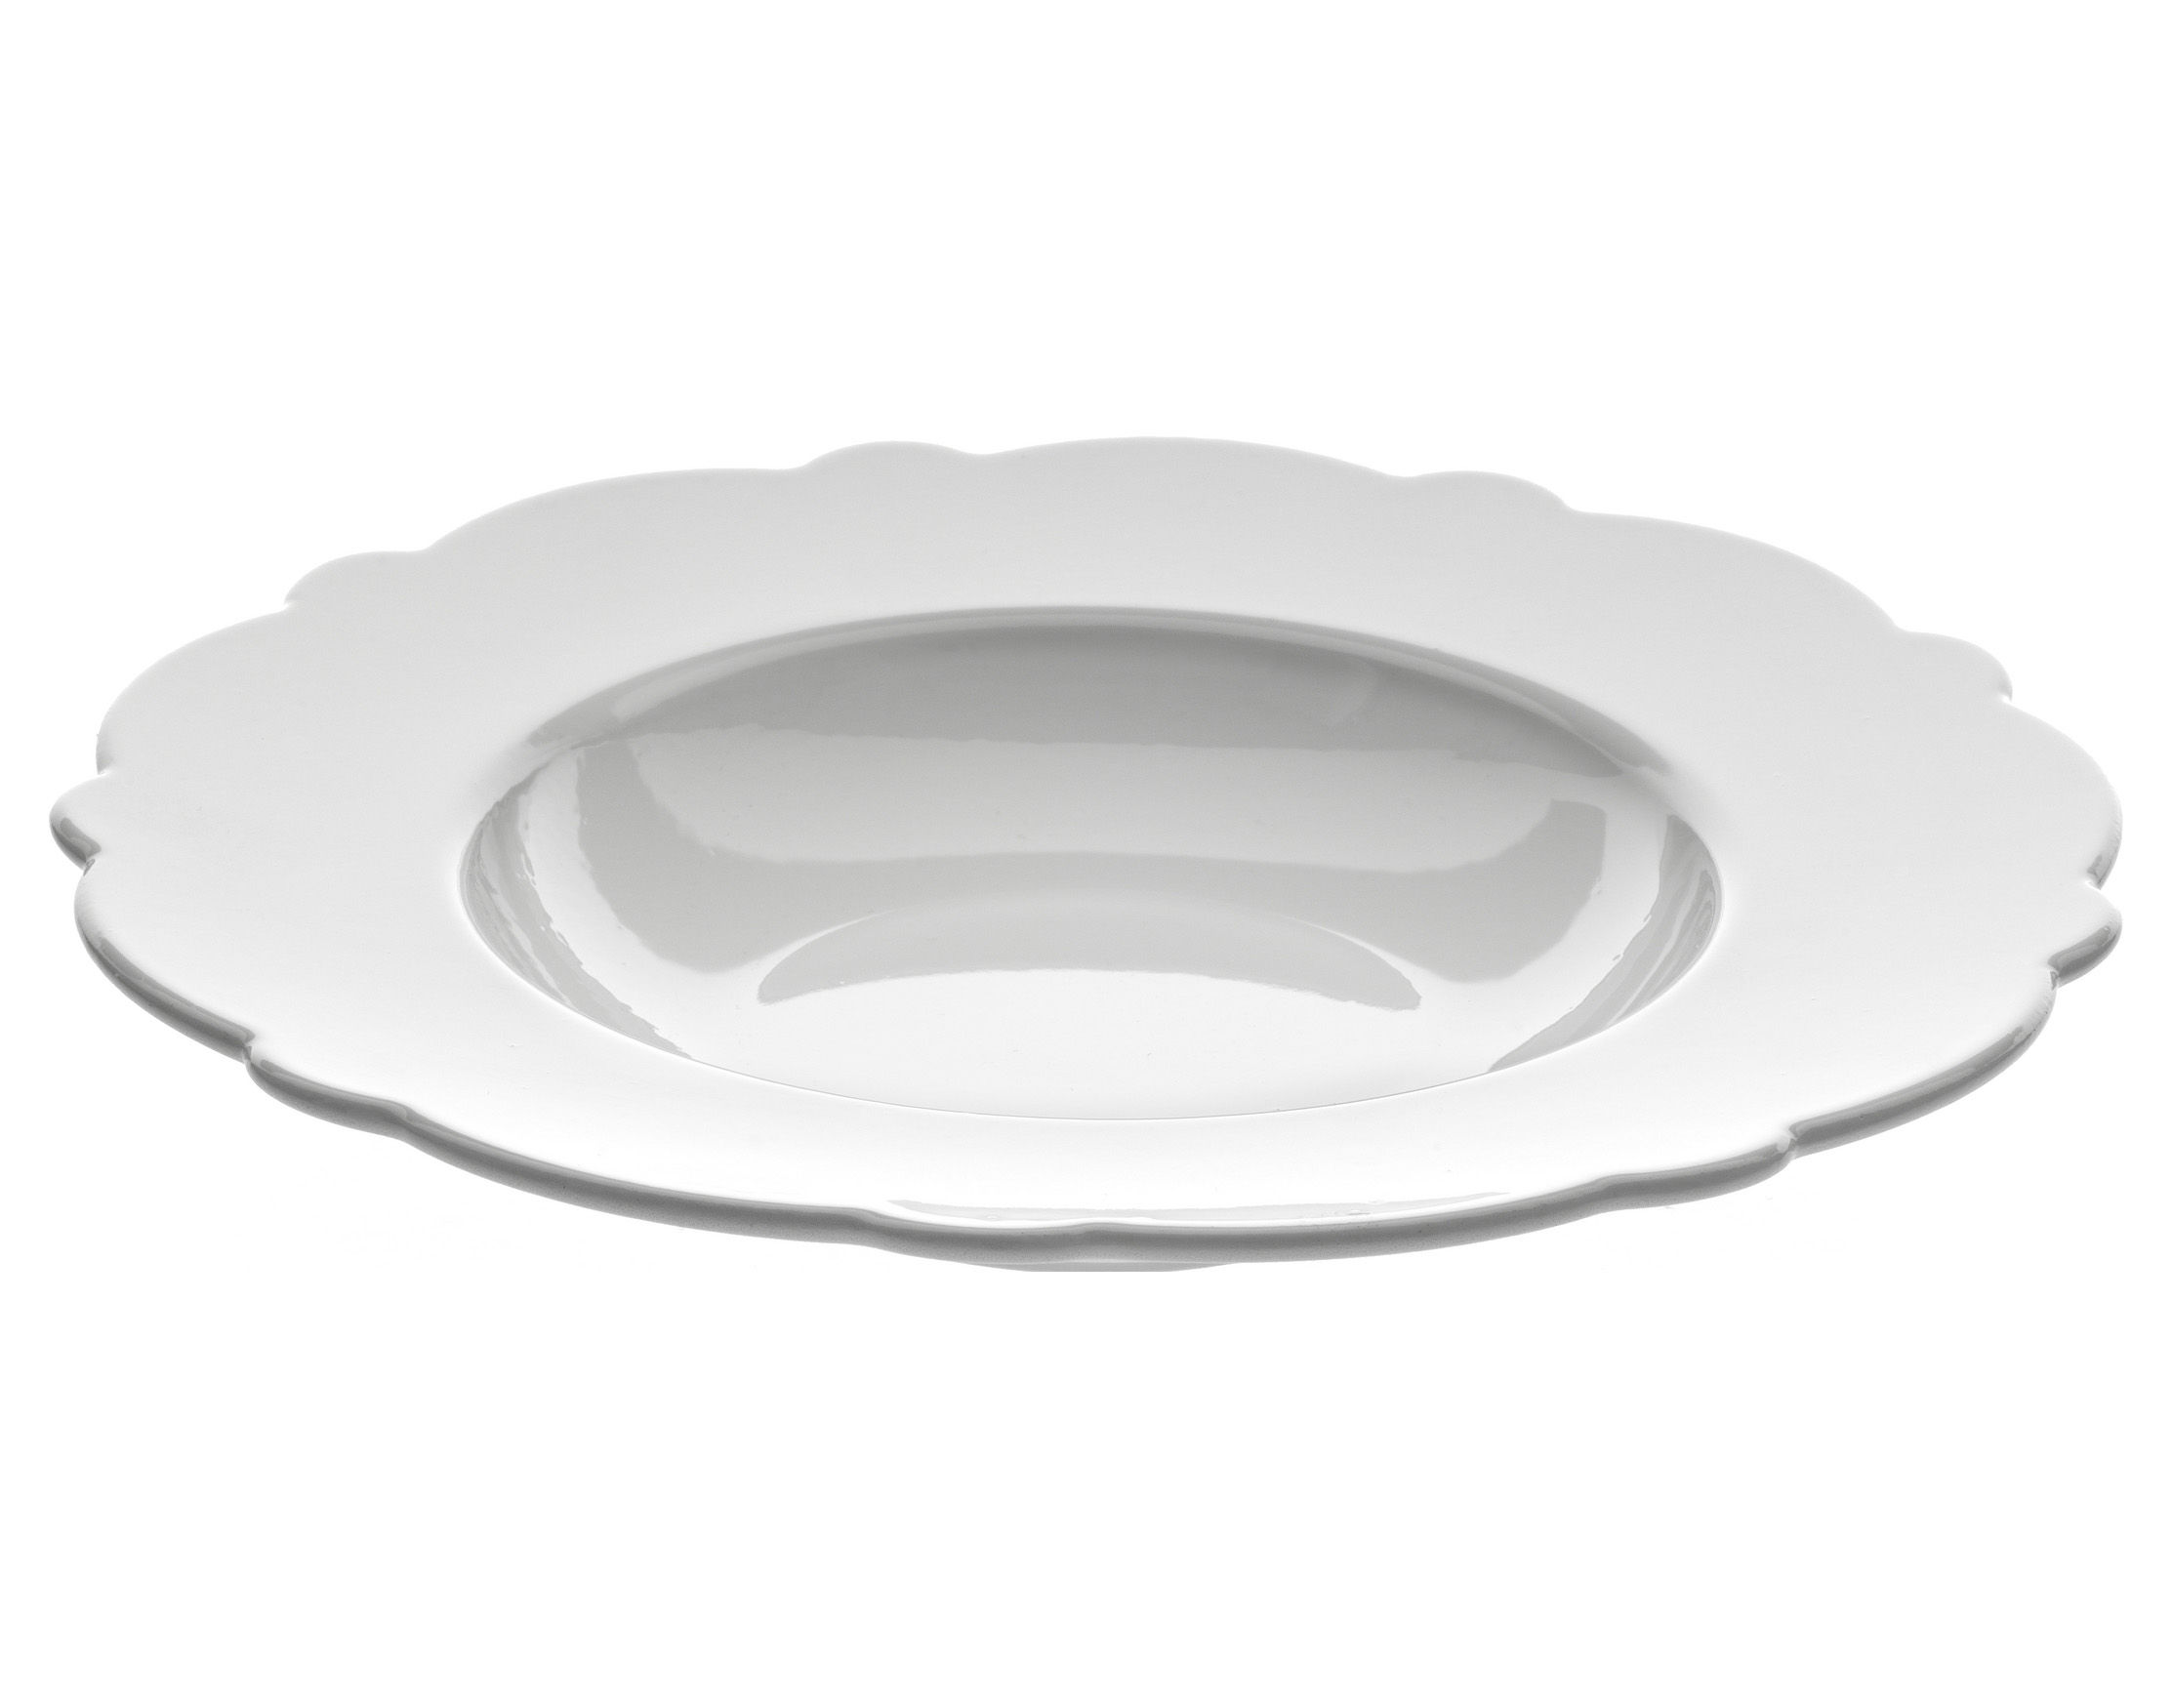 assiette creuse dressed 23 cm assiette creuse 23 cm blanc alessi. Black Bedroom Furniture Sets. Home Design Ideas